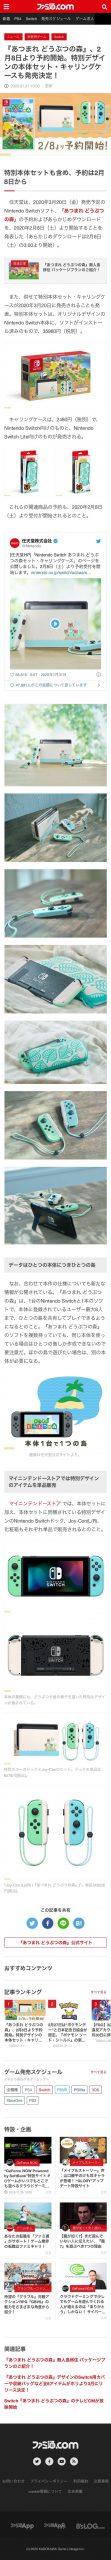 J3MoWLS scaled - 『あつまれ どうぶつの森』2月8日予約開始!特別デザインの本体セット・キャリングケースも発売決定!